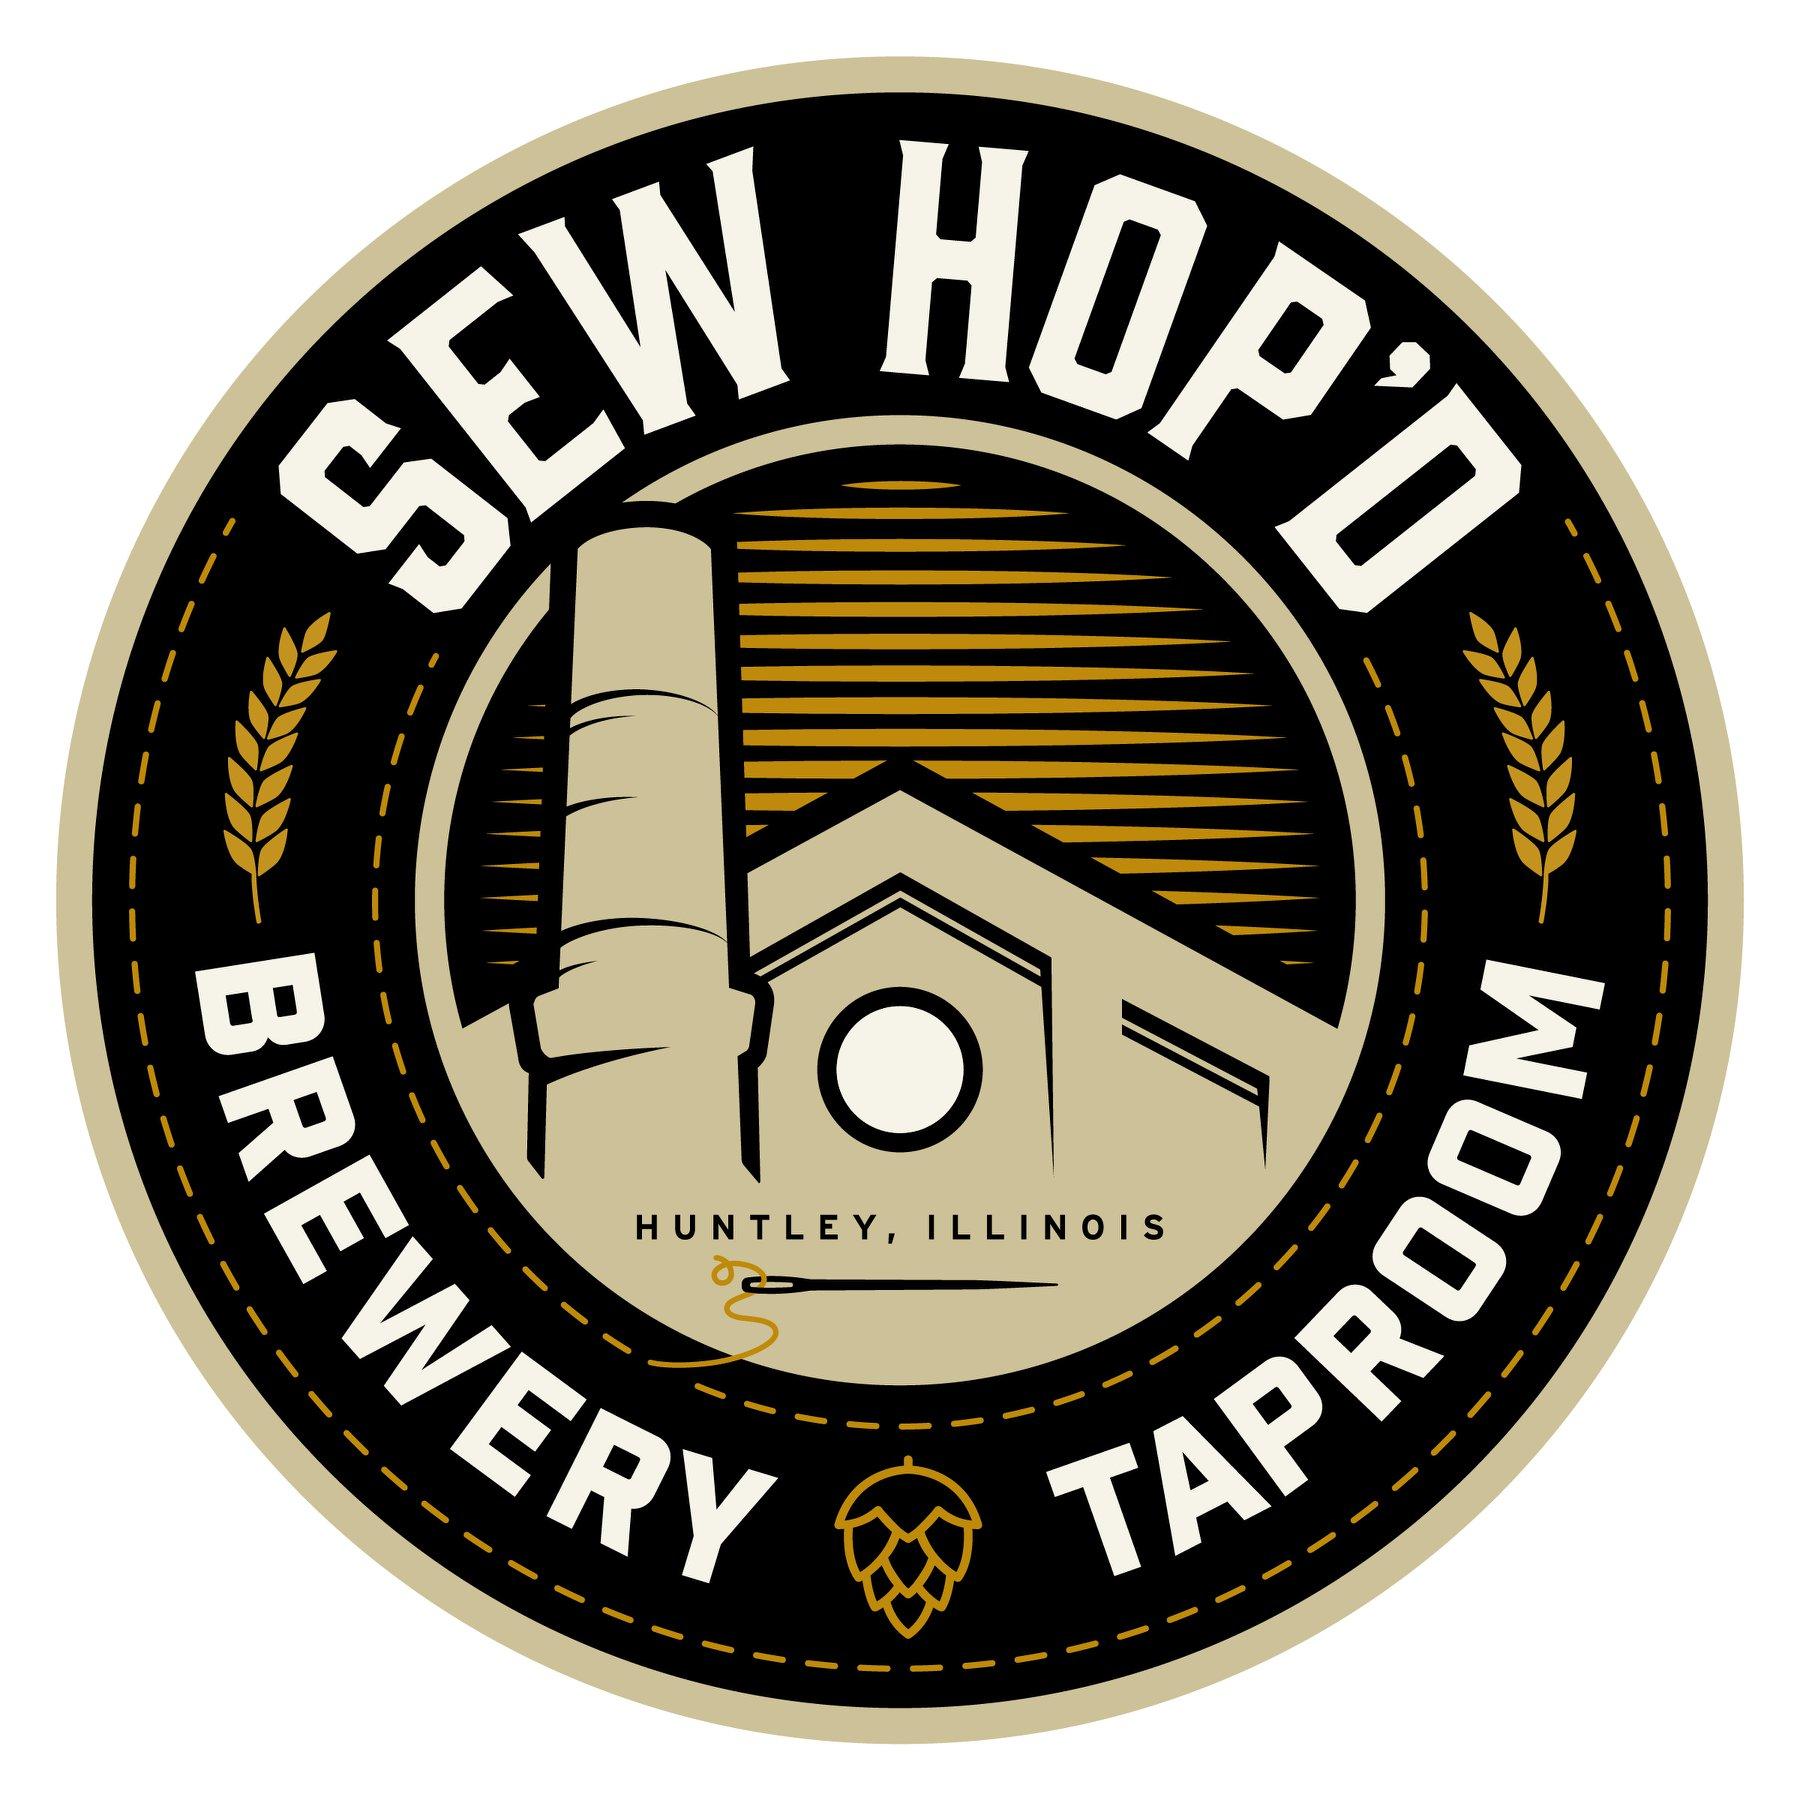 SewHopd_Logo.jpg